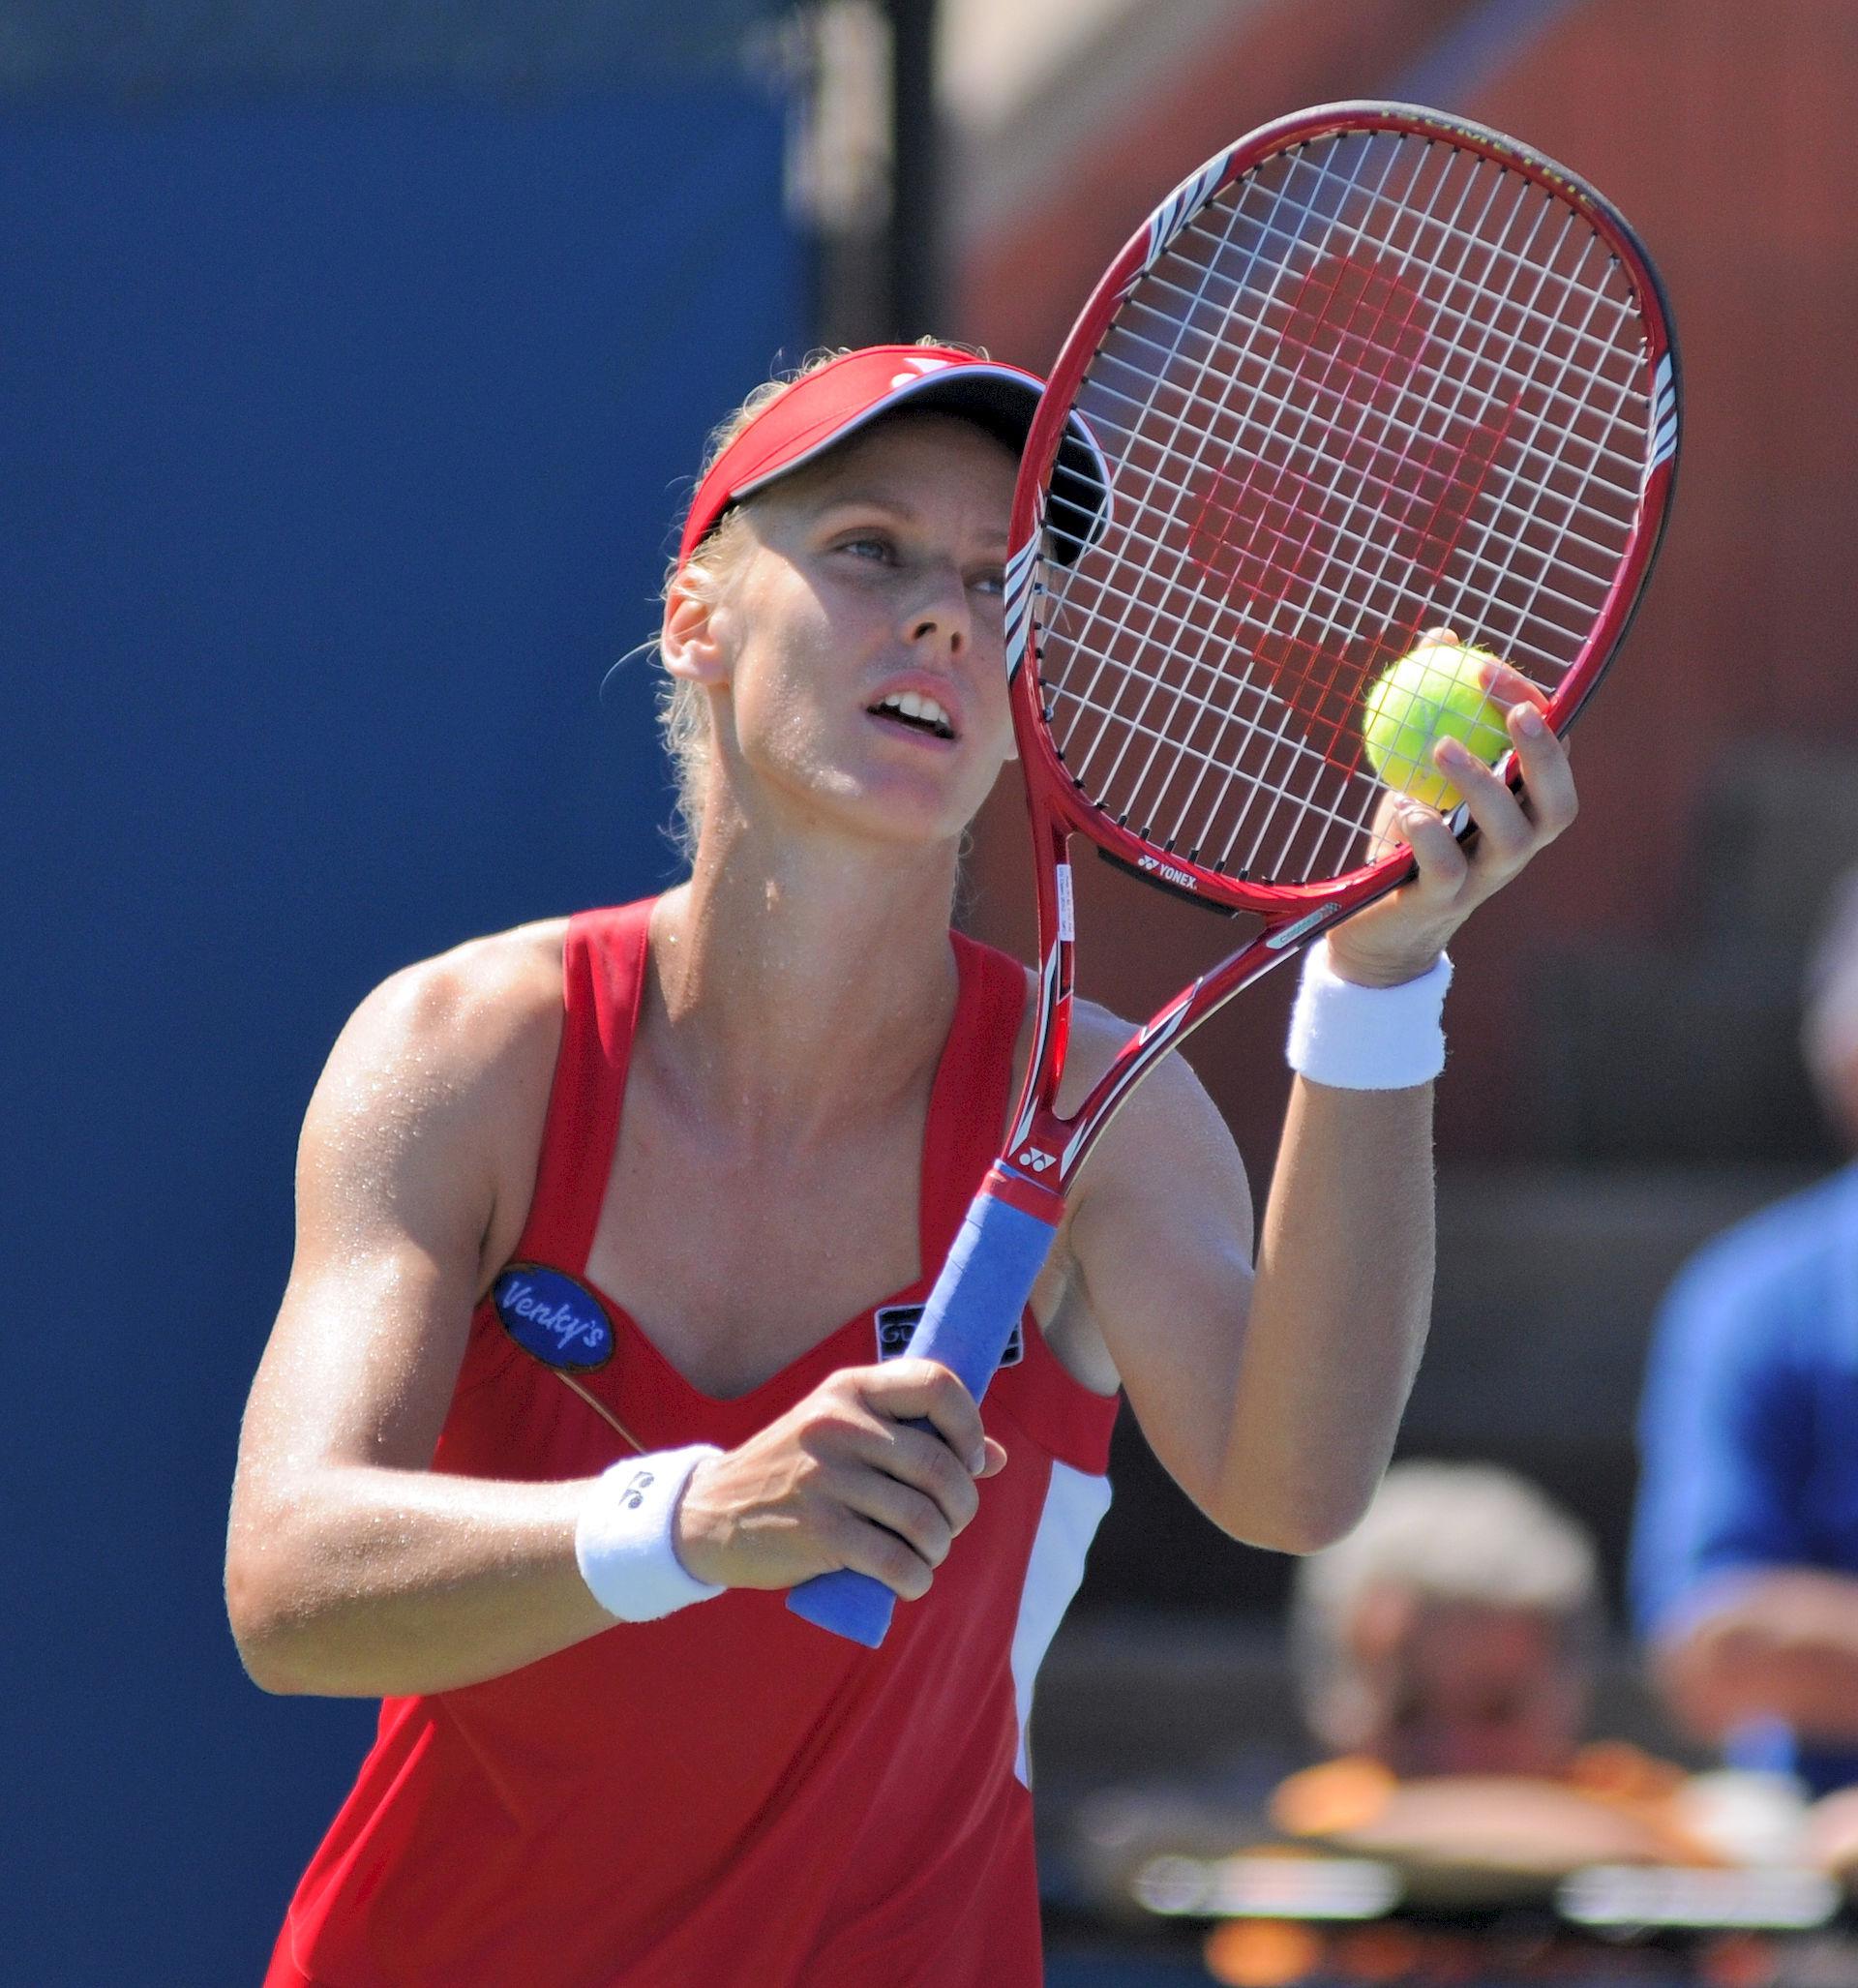 Photo of Elena Dementieva: Russian tennis player